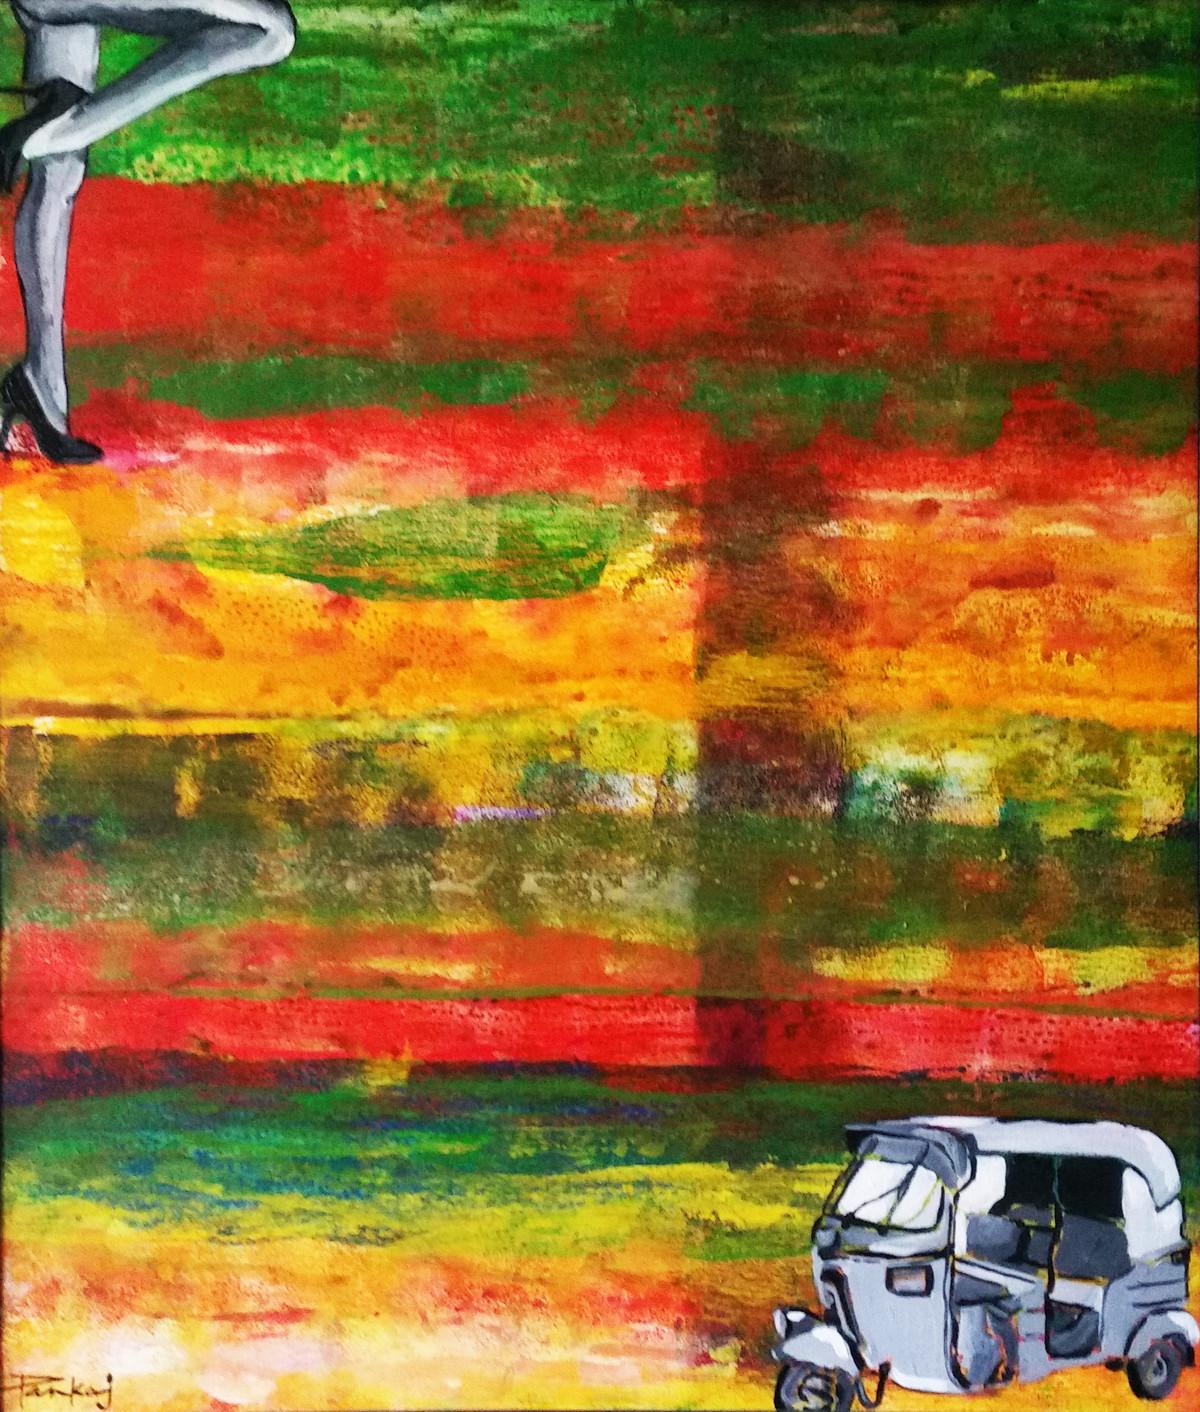 The Meeting Digital Print by Pankaj Kumar Saxena,Abstract